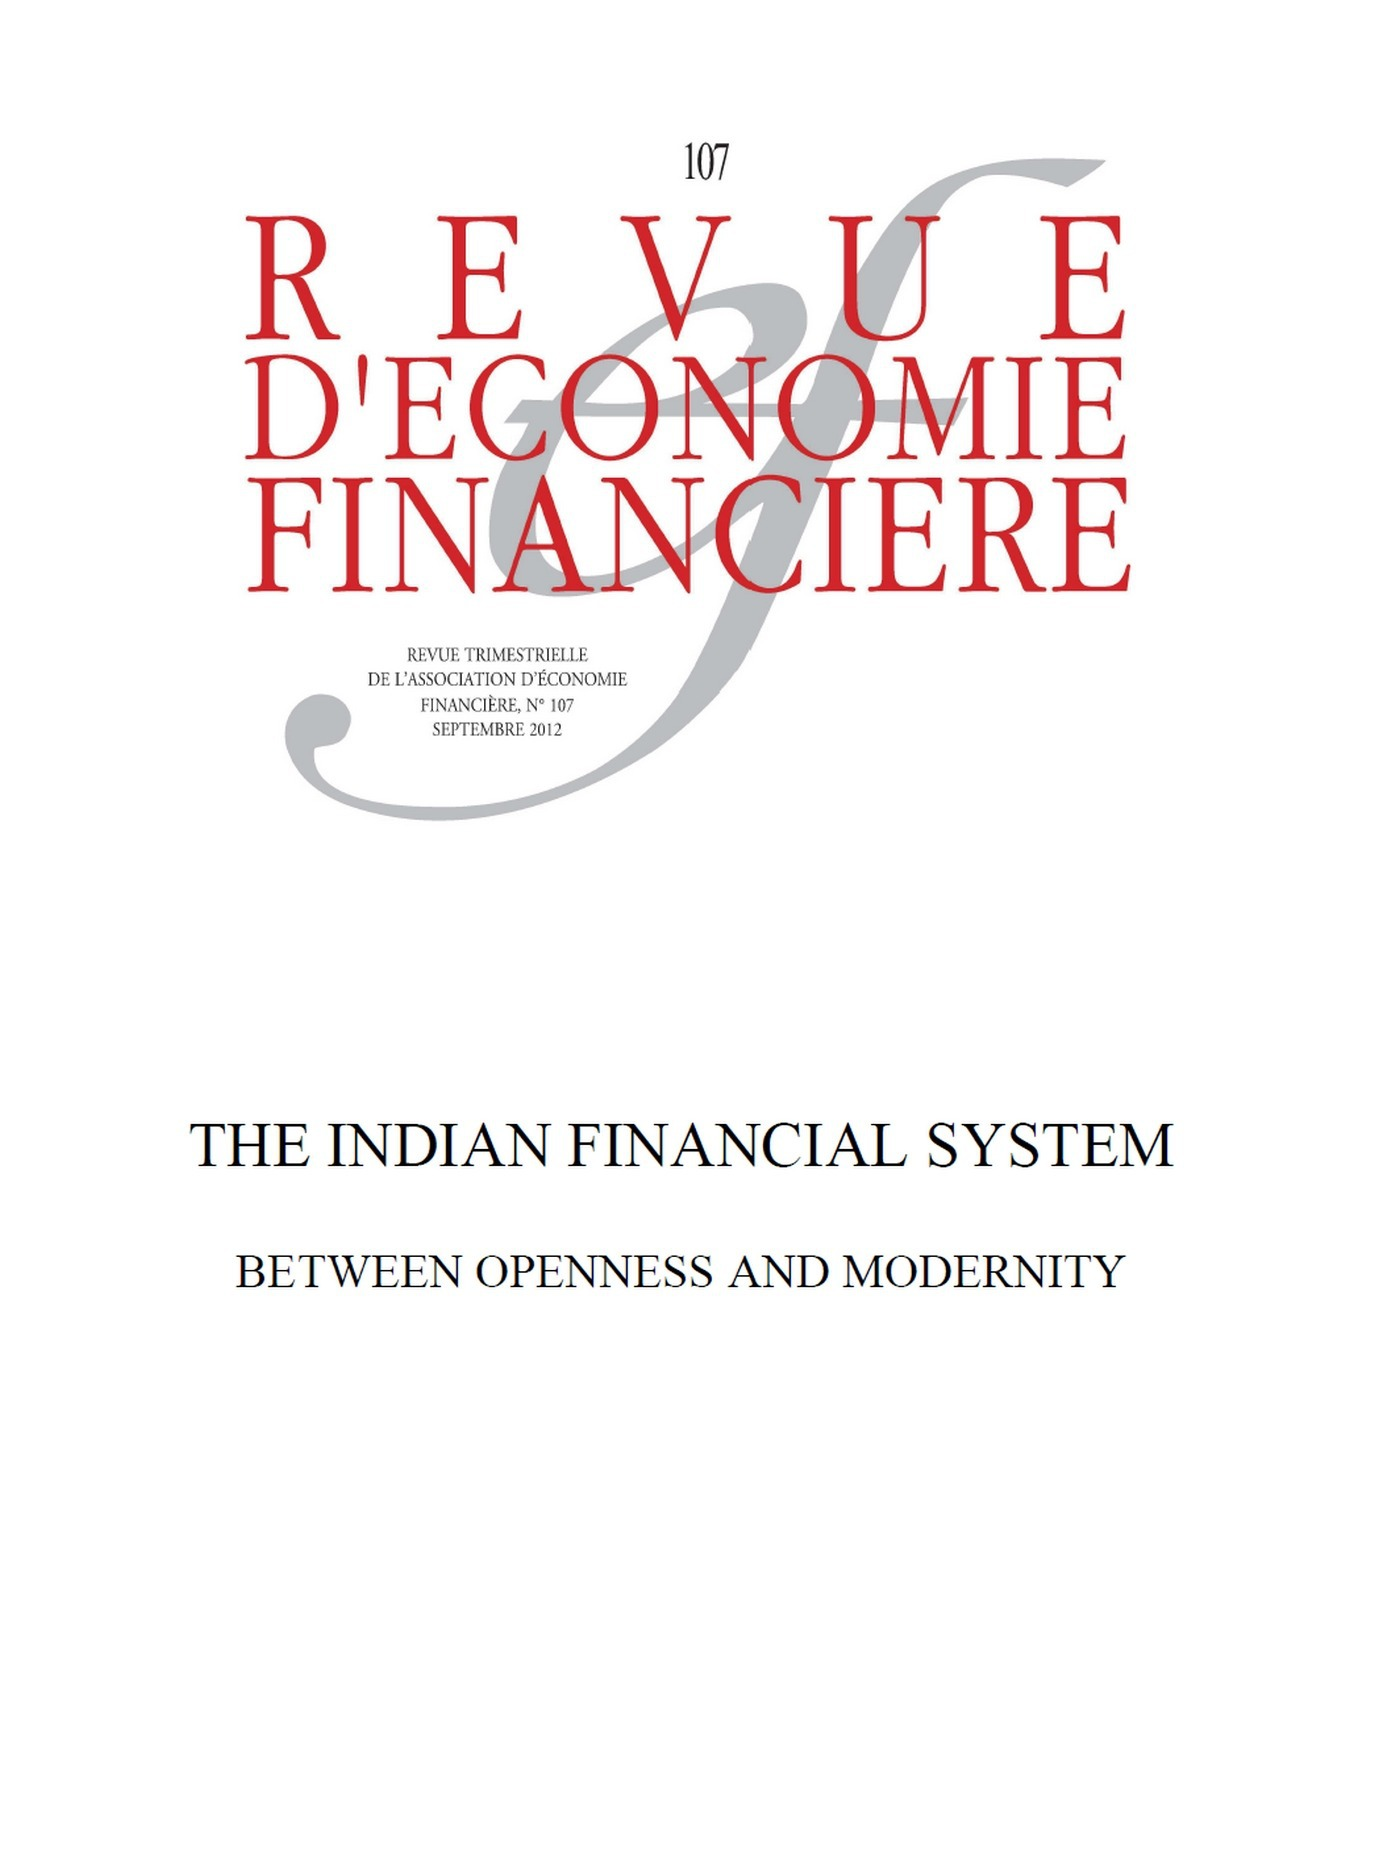 Club Du Cepii Jean-Joseph Boillot The Indian Financial System